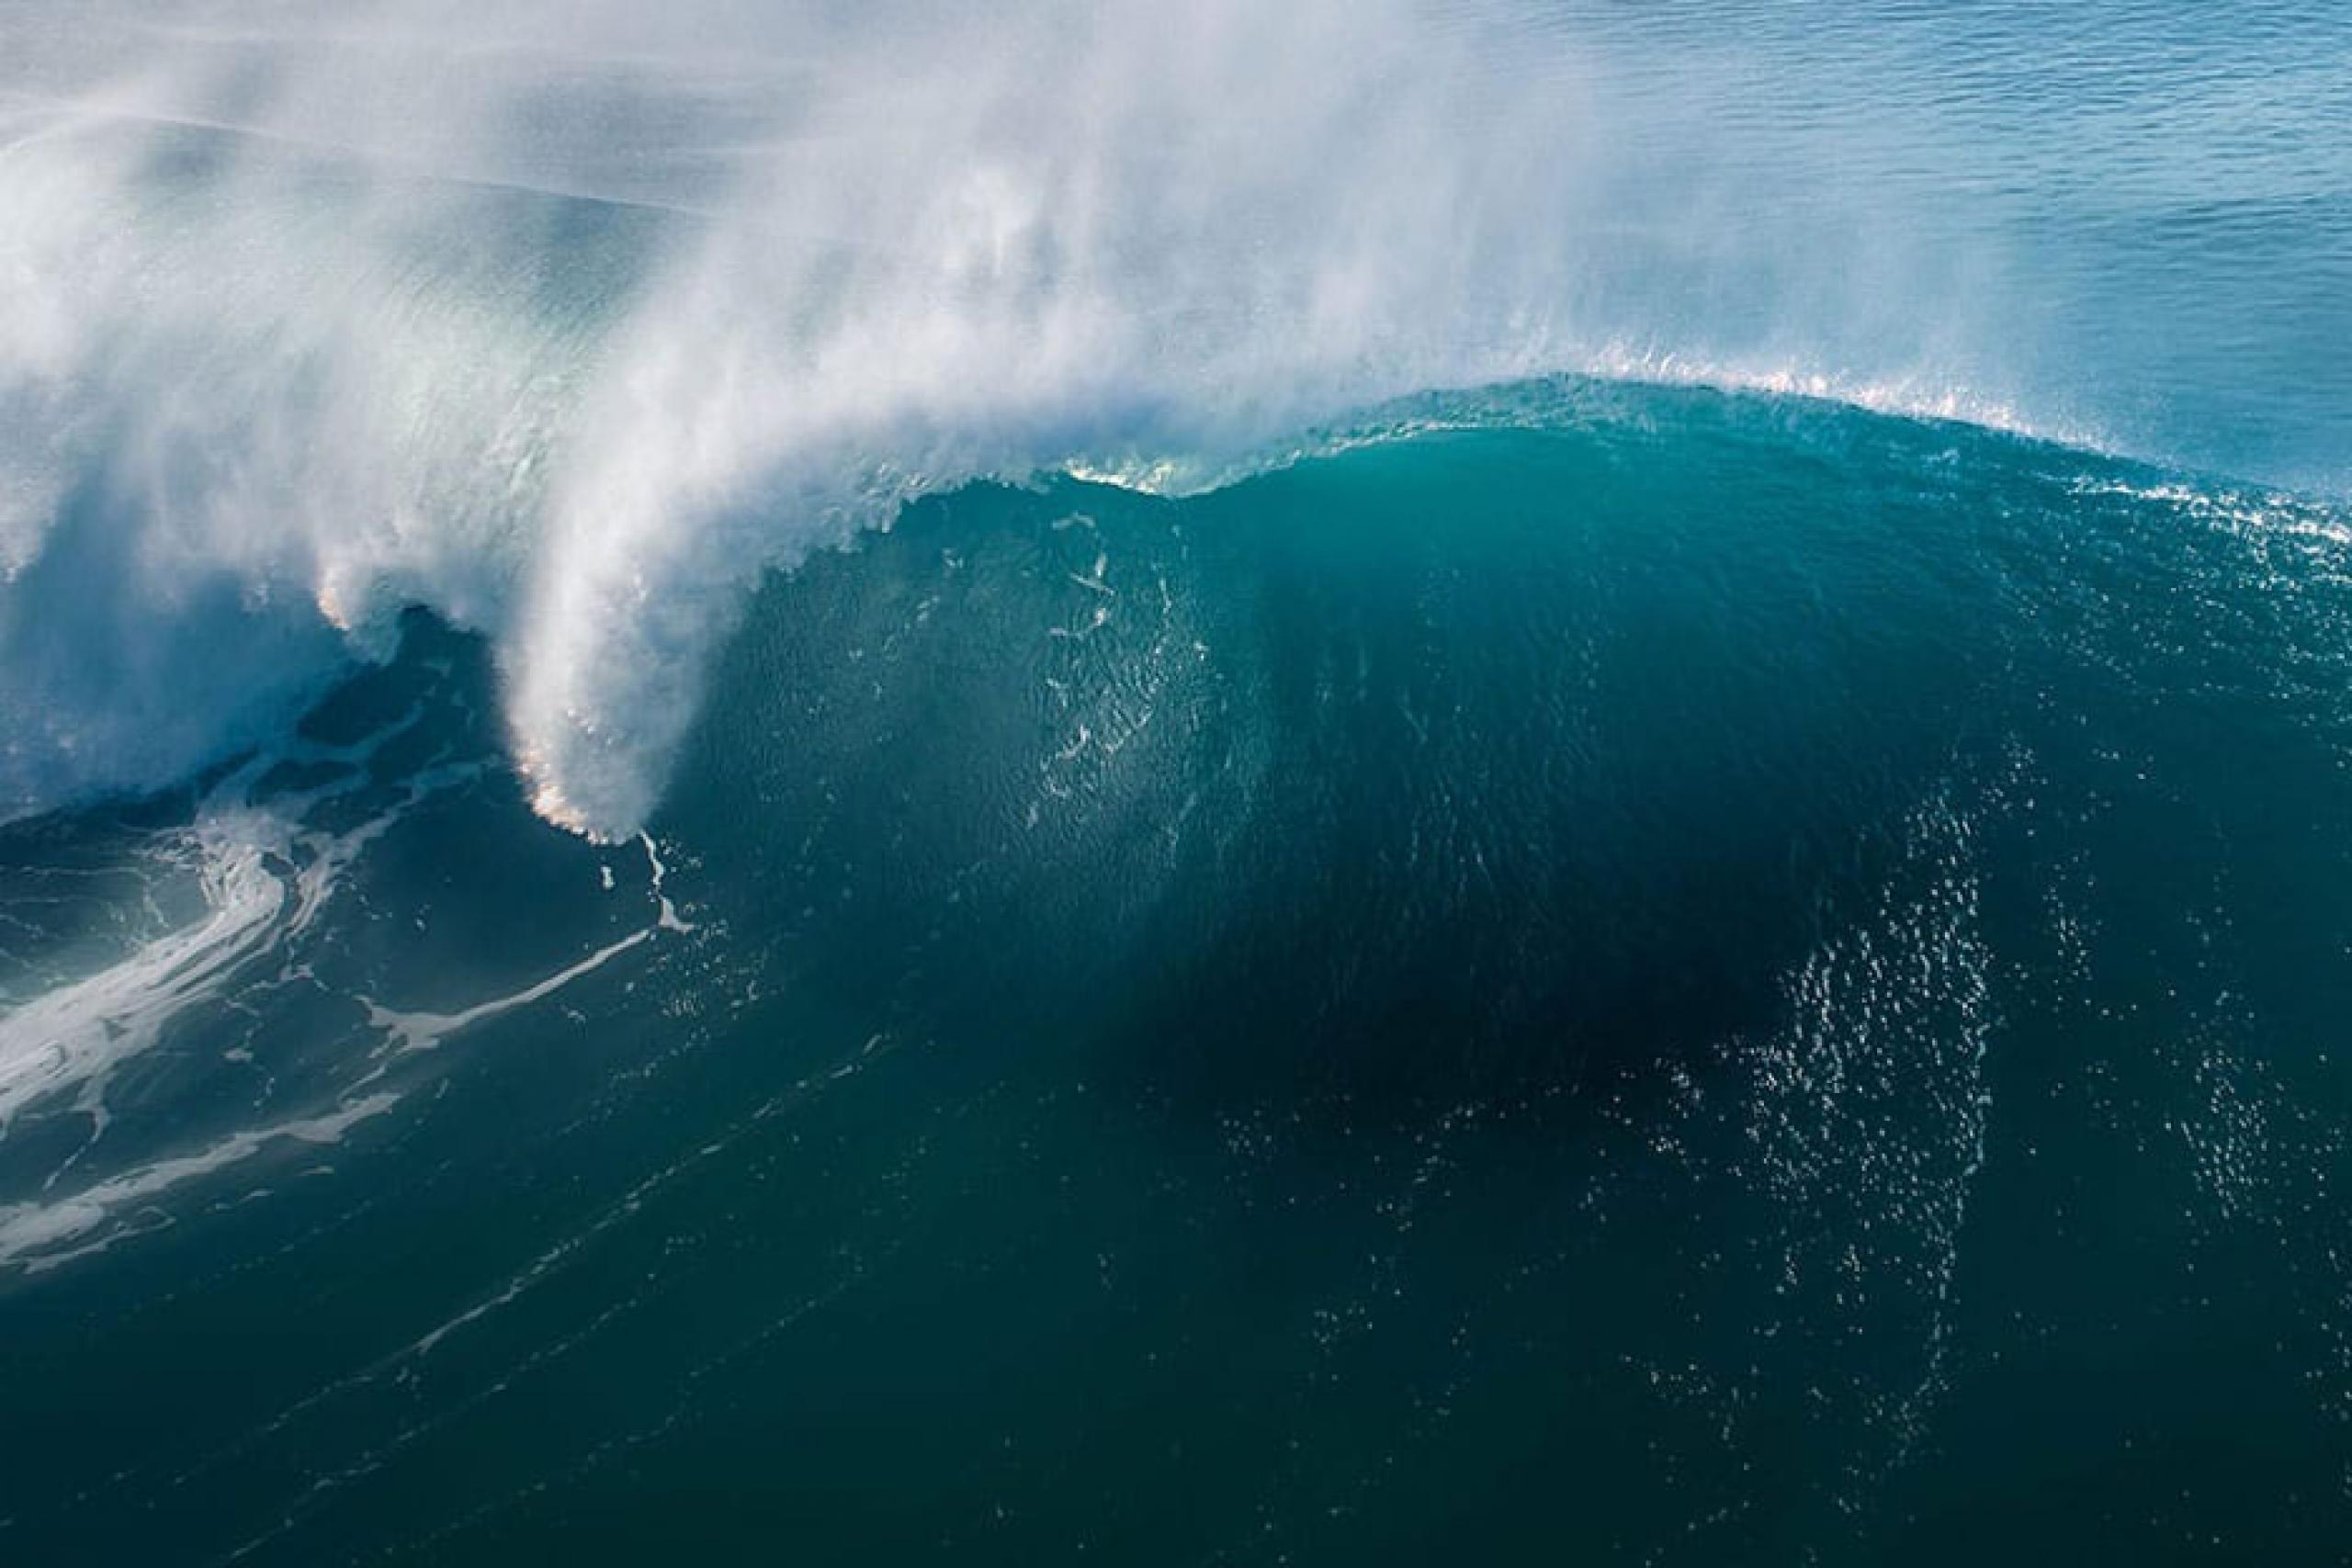 Photo of large ocean wave crest